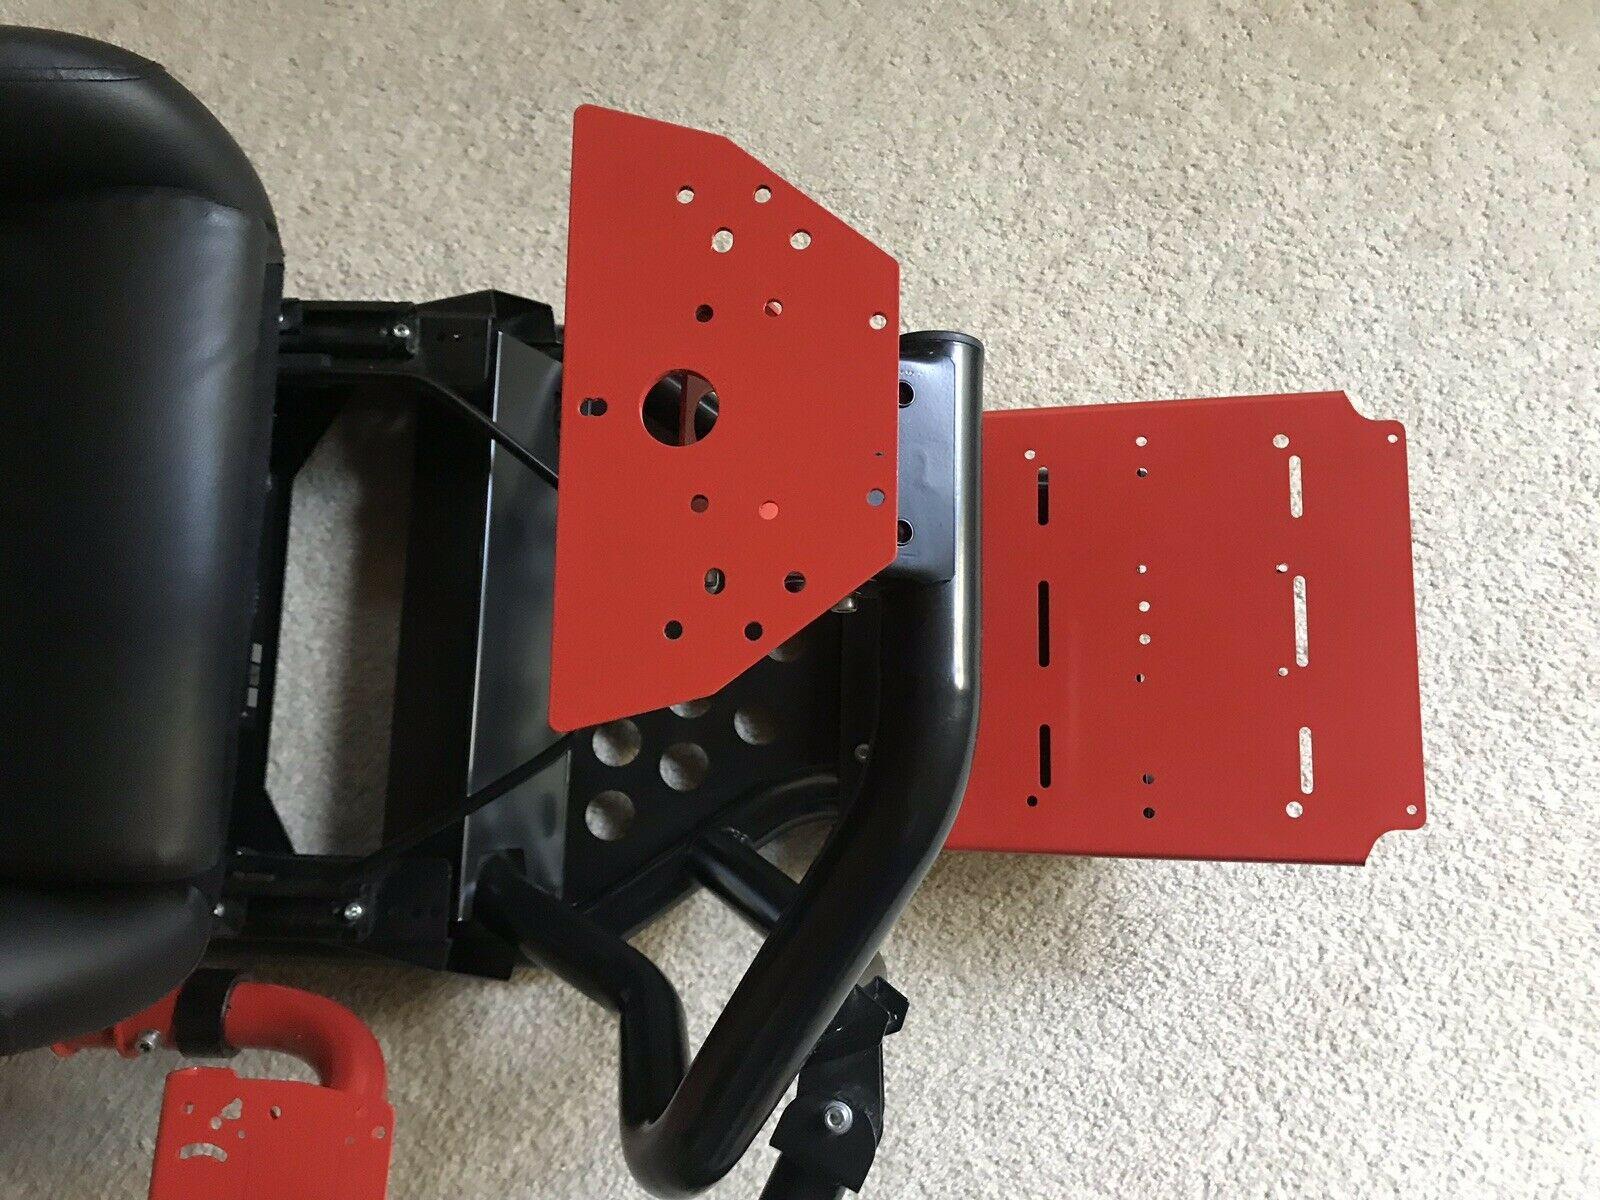 FS: Rseat RS1 and Next Level Racing Motion Platform V3 - Sim